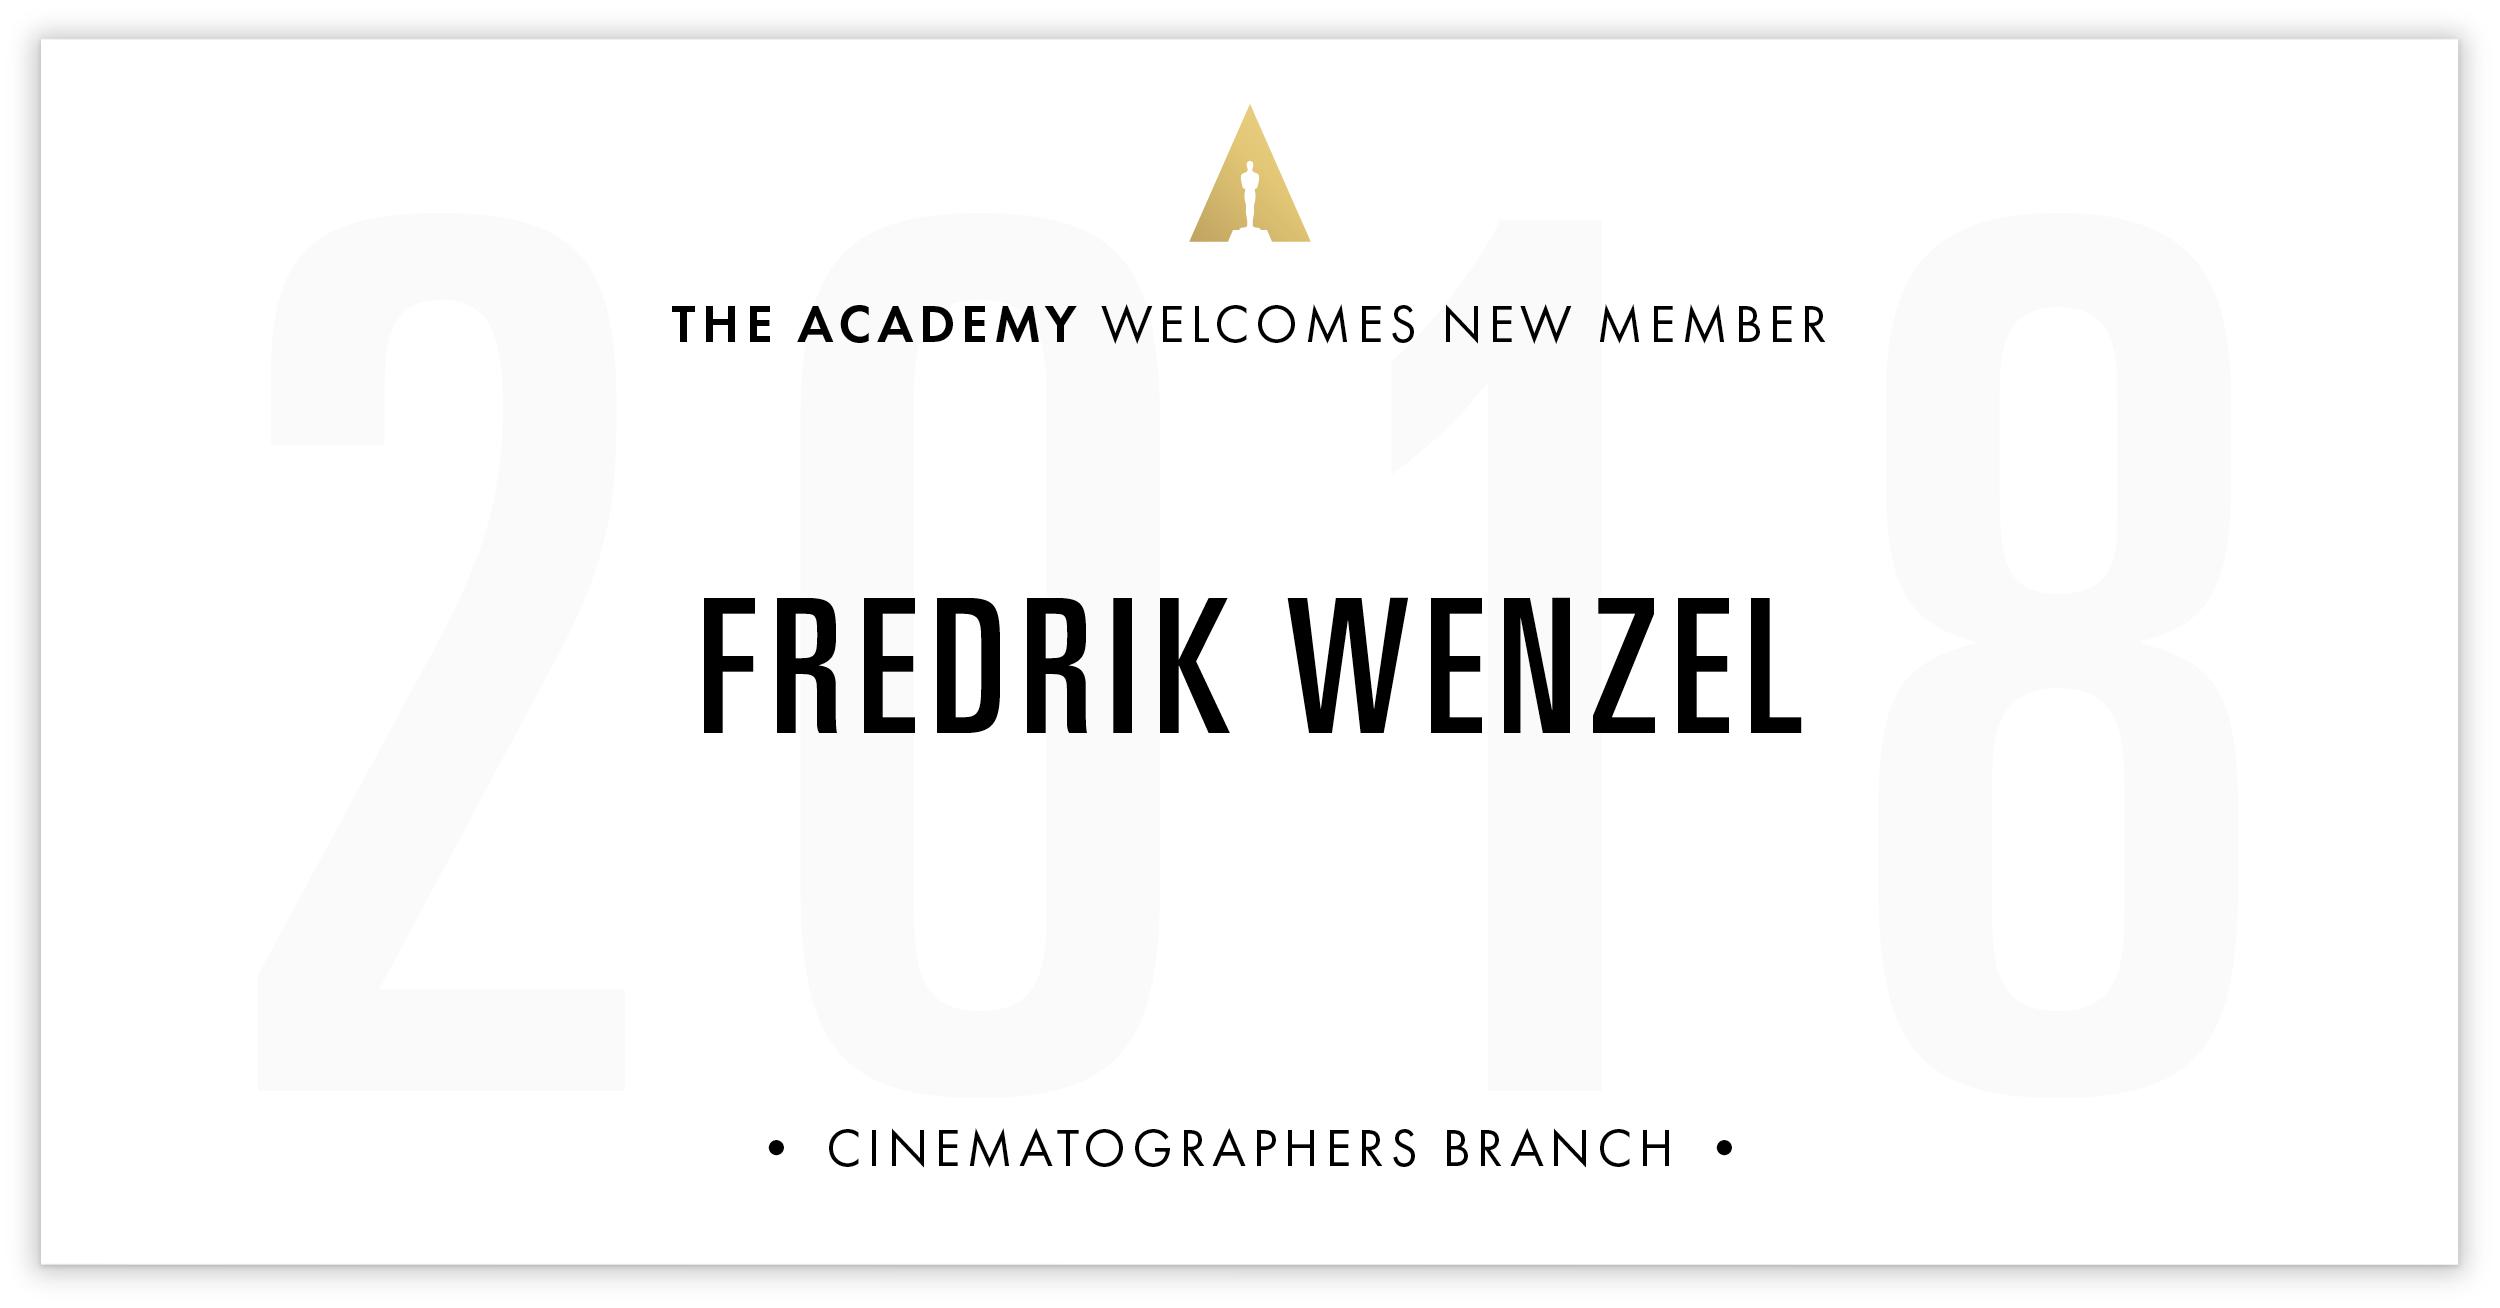 Fredrik Wenzel is invited!